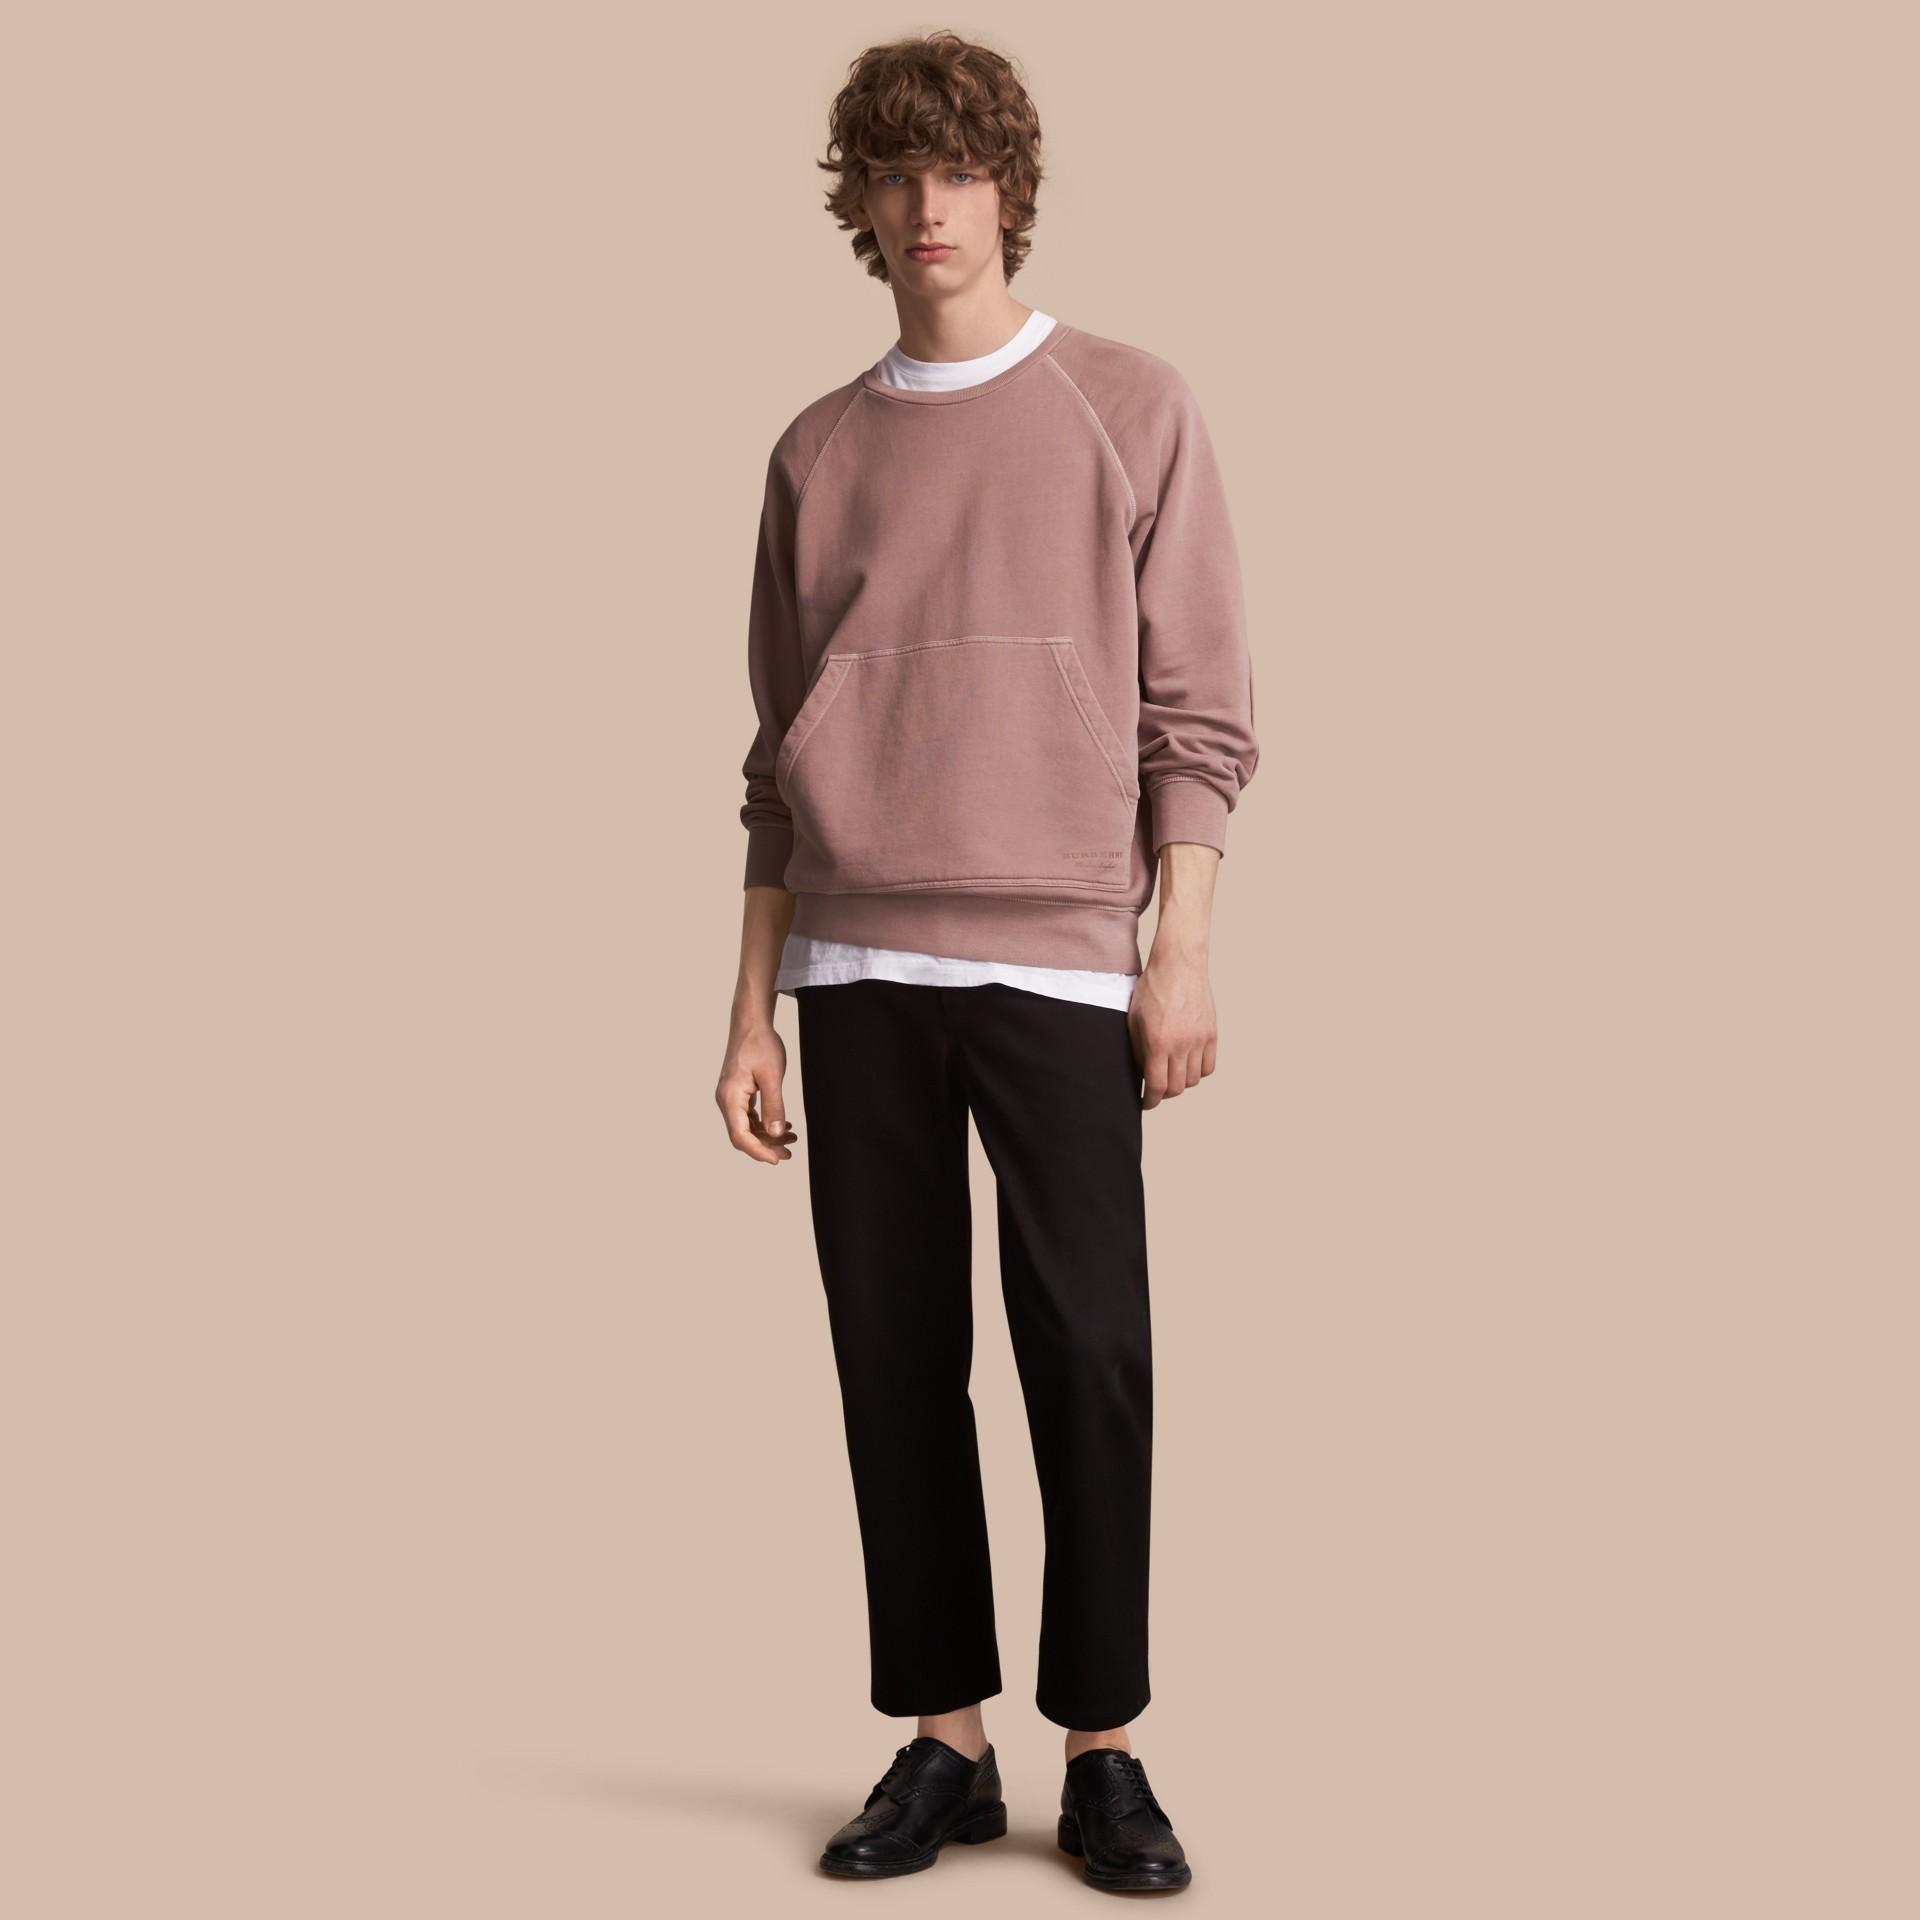 Unisex Pigment-dyed Cotton Oversize Sweatshirt Dusty Mauve - gallery image 1